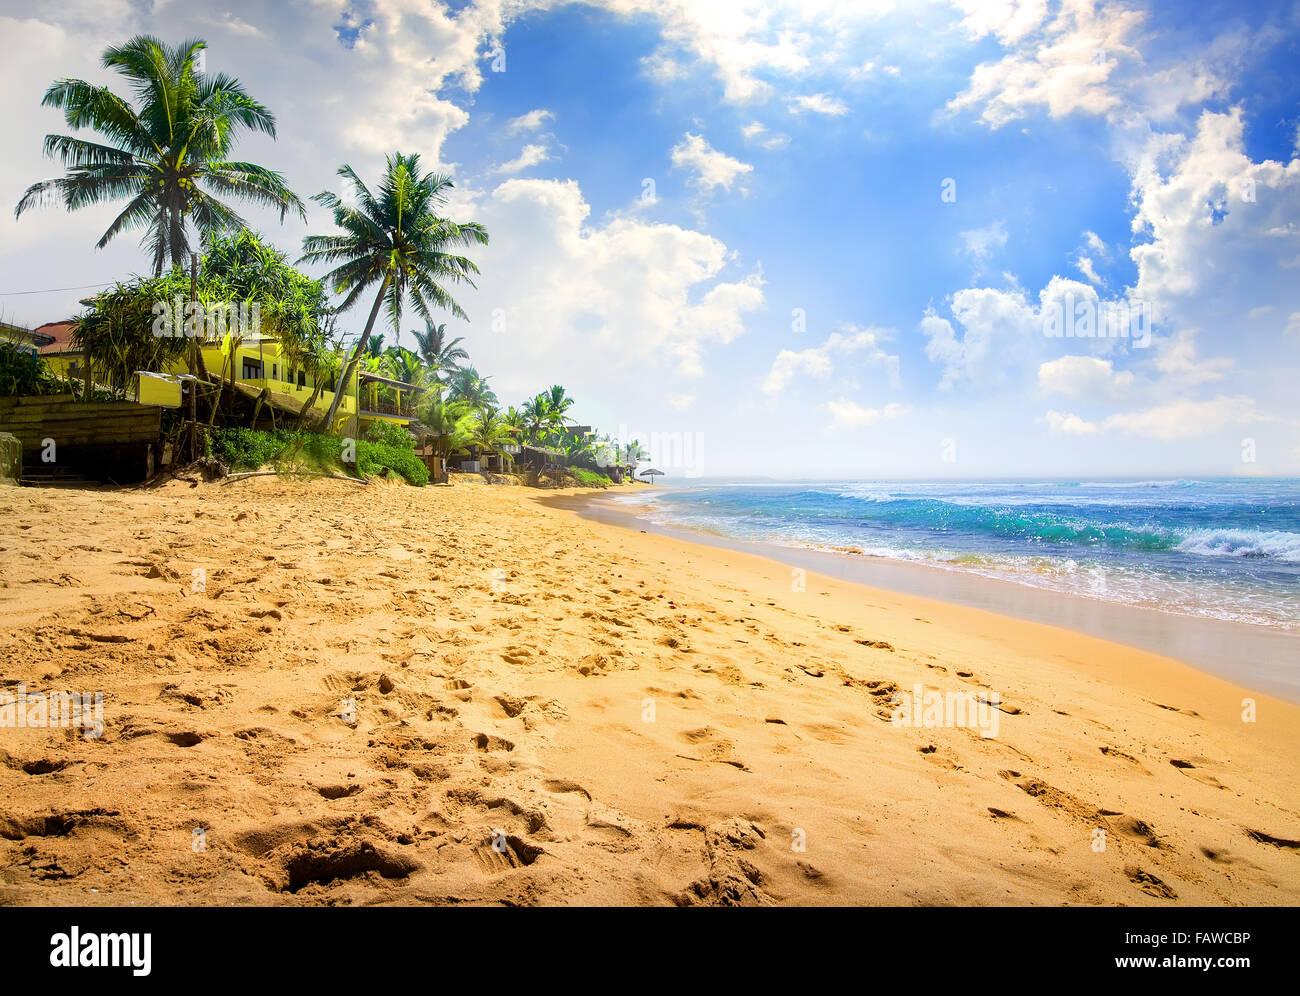 Sunlight over beautiful tropical beach near ocean - Stock Image